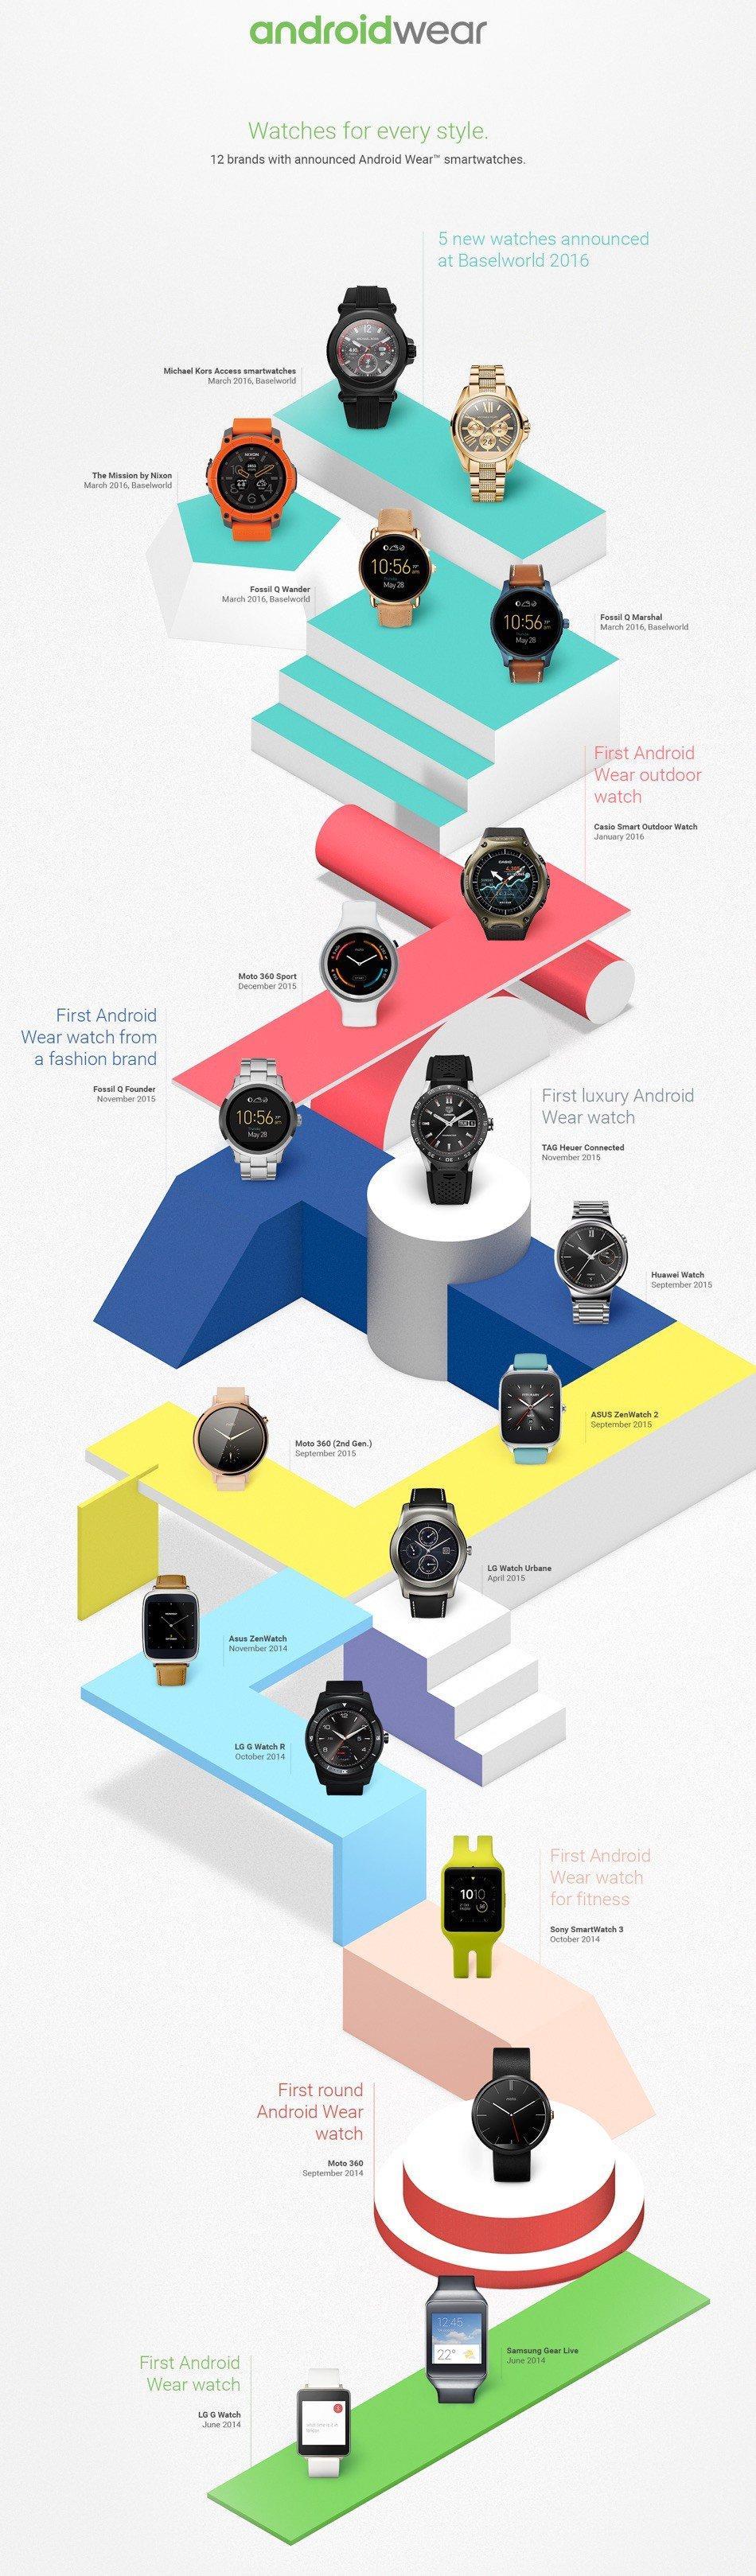 Timeline des montres Android Wear